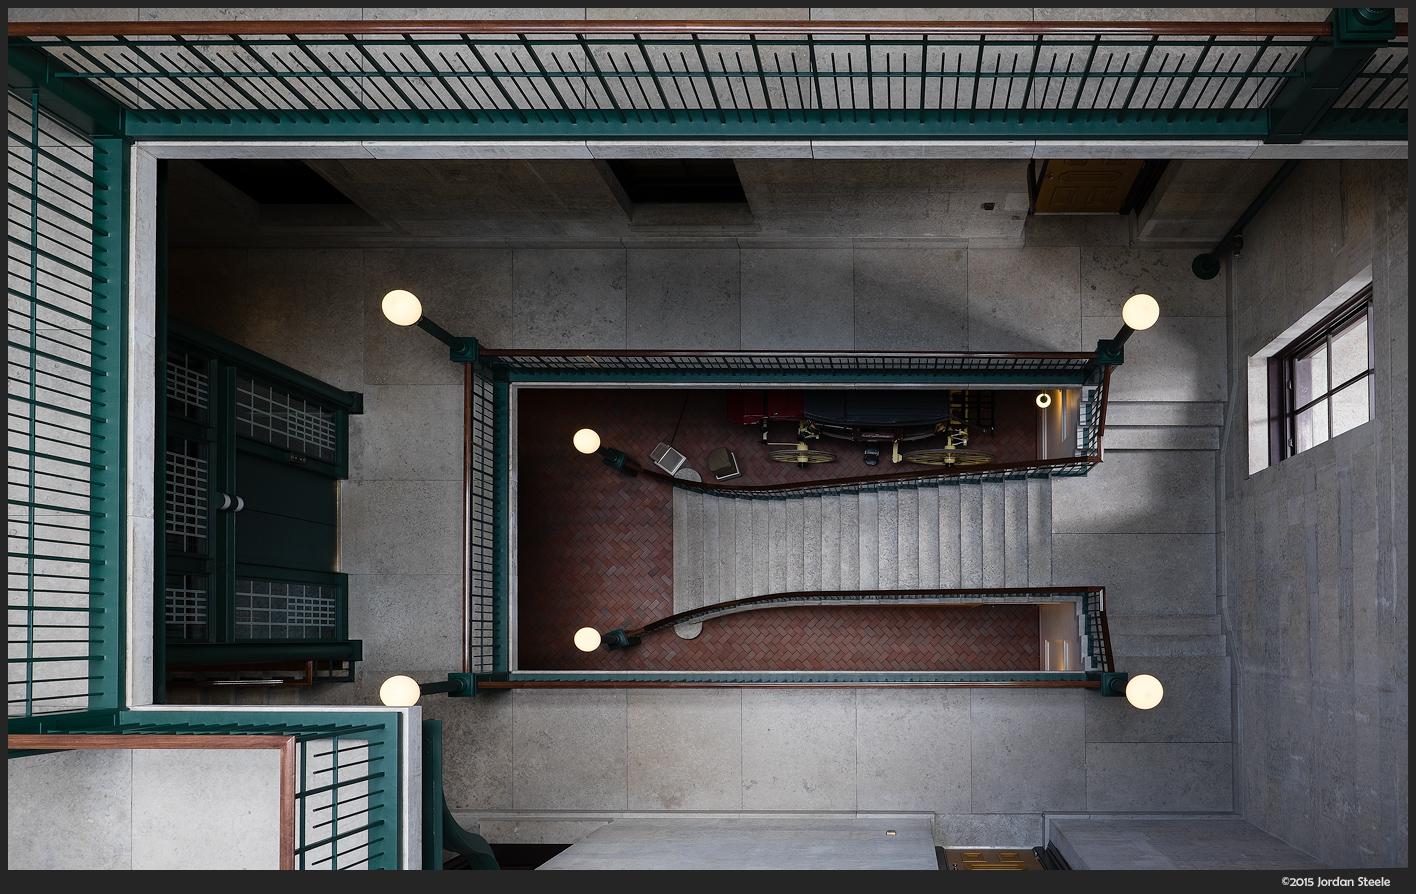 Stairs - Fujifilm X-T1 with Fujinon XF 16mm f/1.4 WR @ f/4